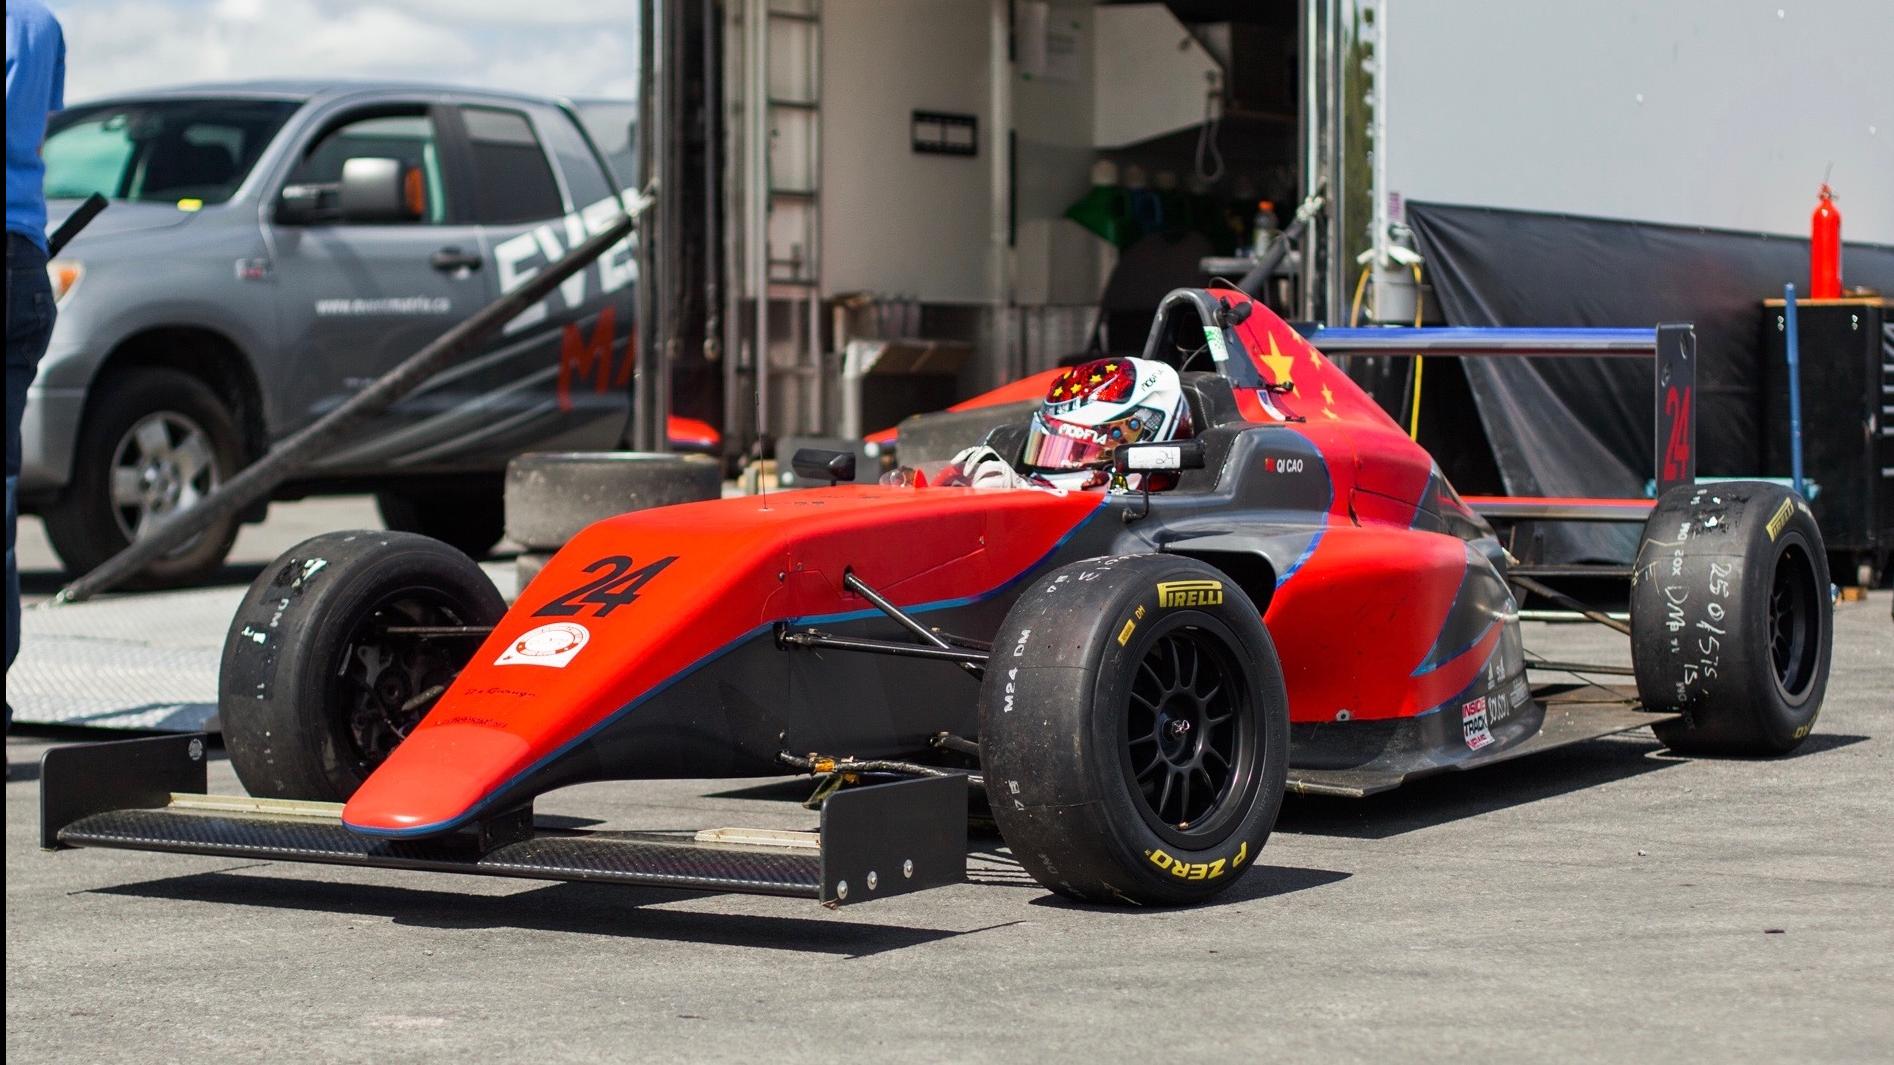 2014 Tatuus F4 – T014 Chassis